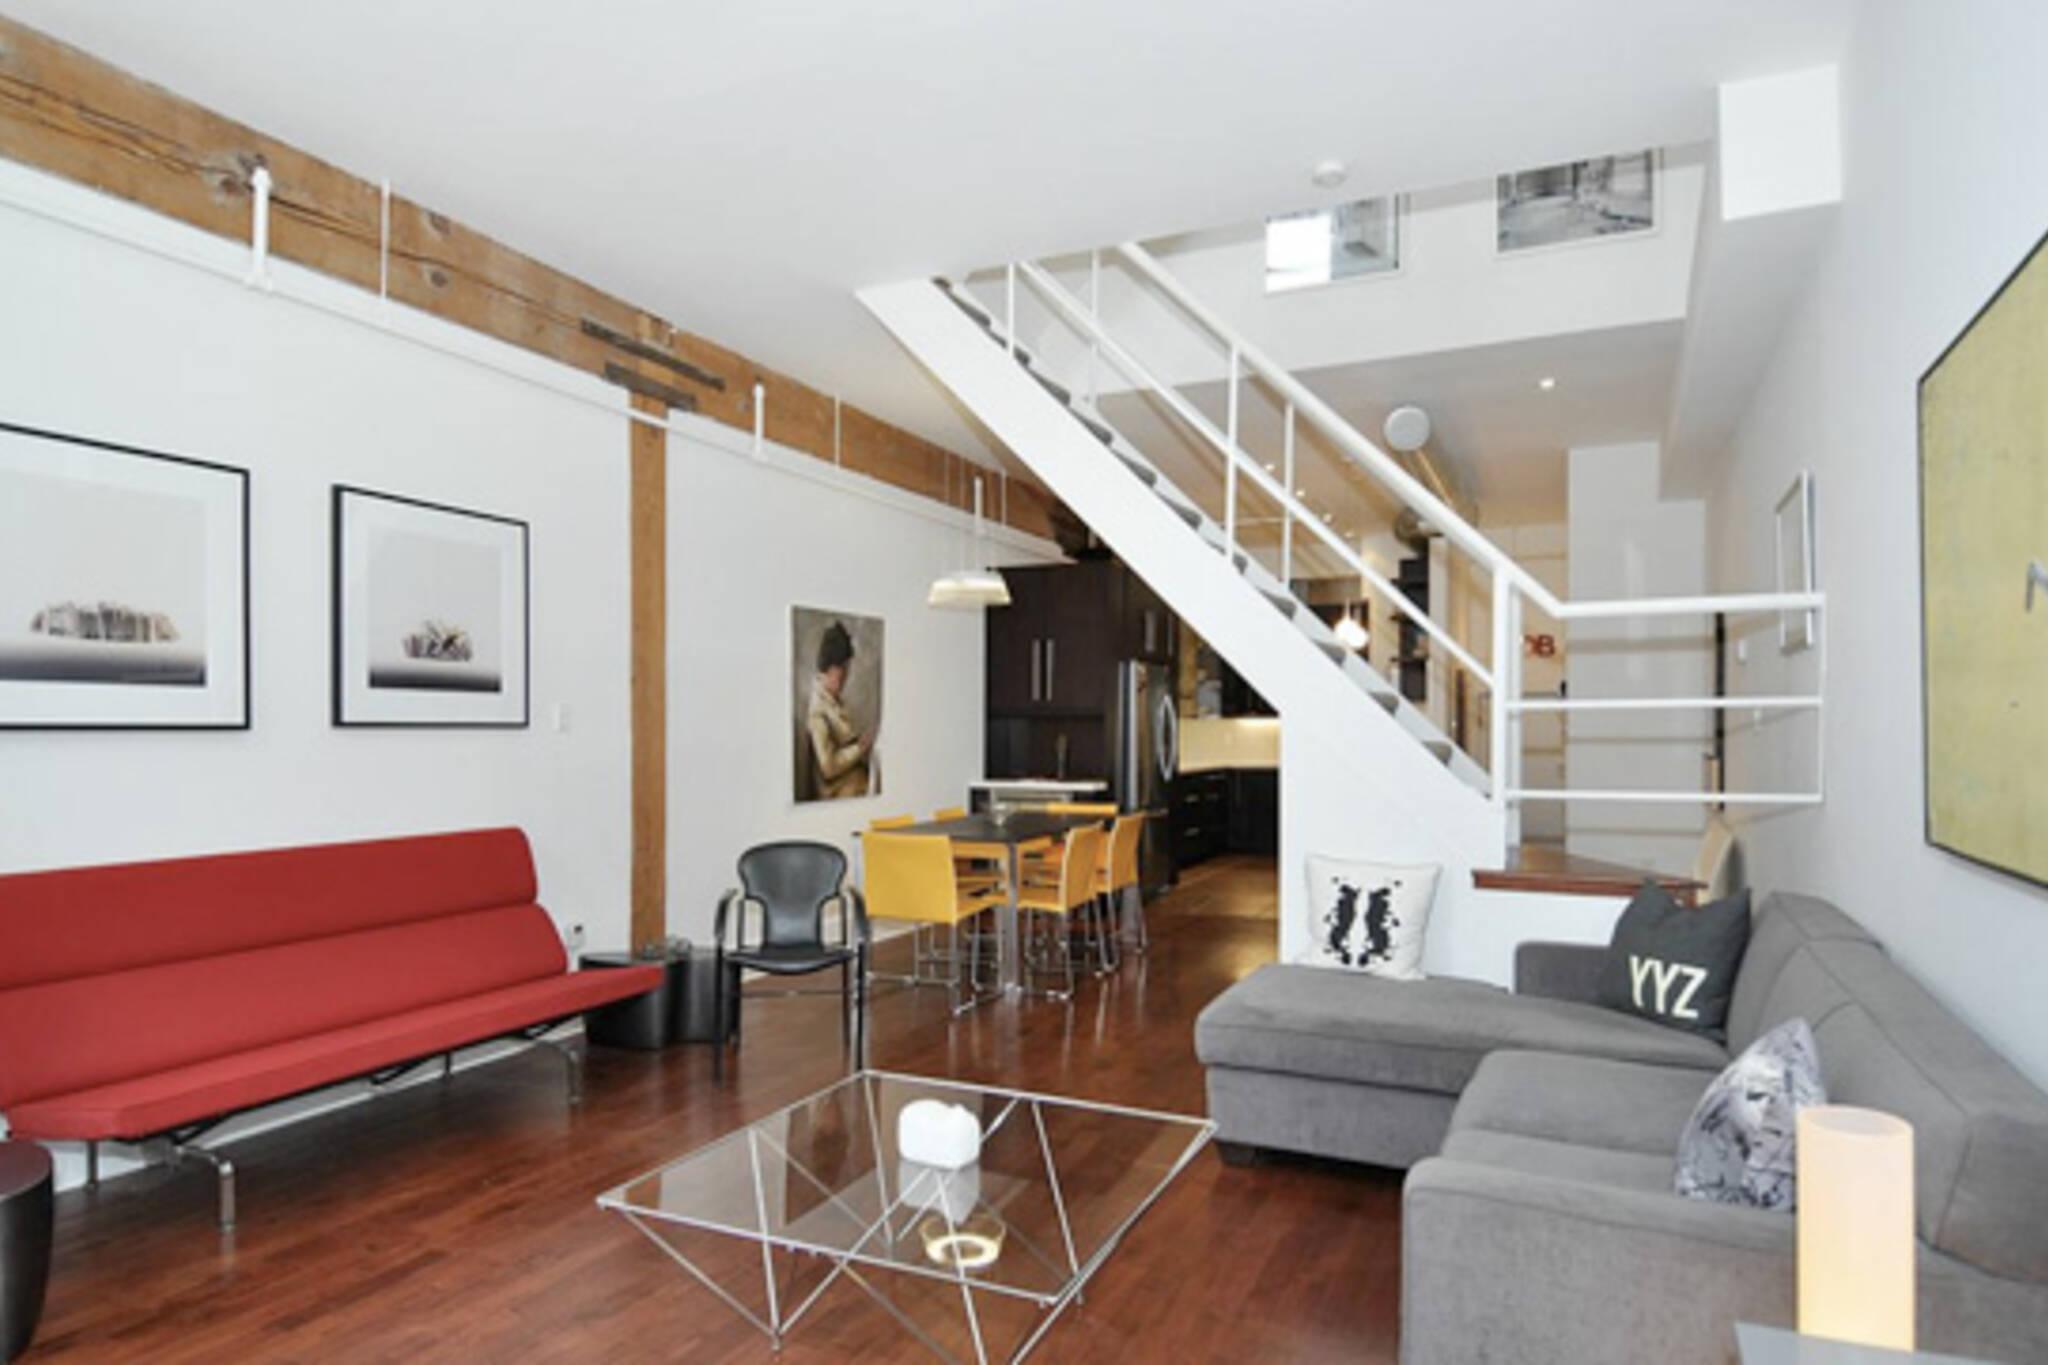 75 Markham Toronto